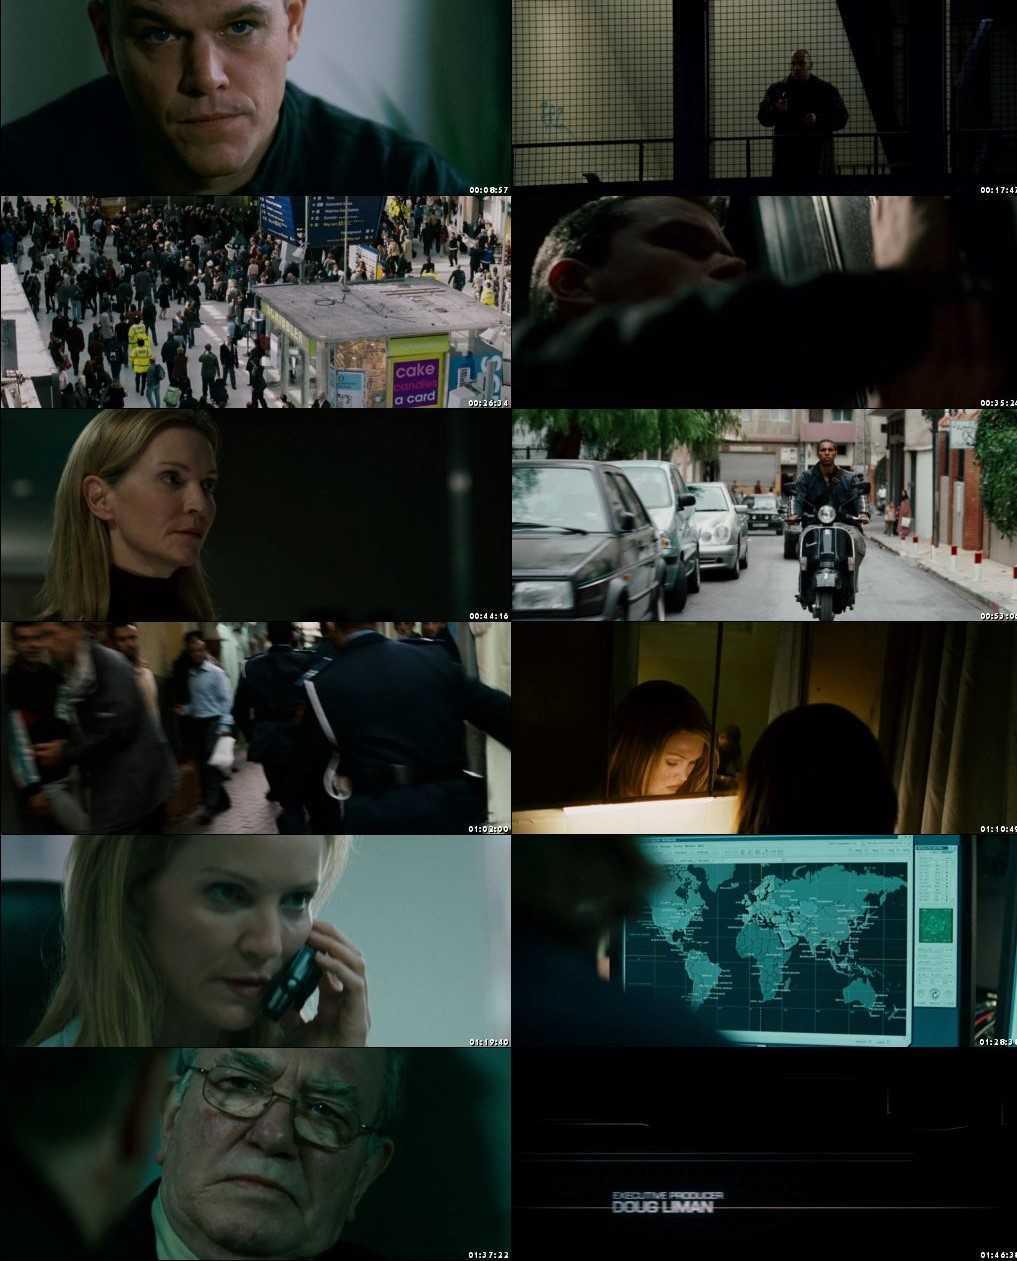 The Bourne Ultimatum 2007 Screenshot 1080p